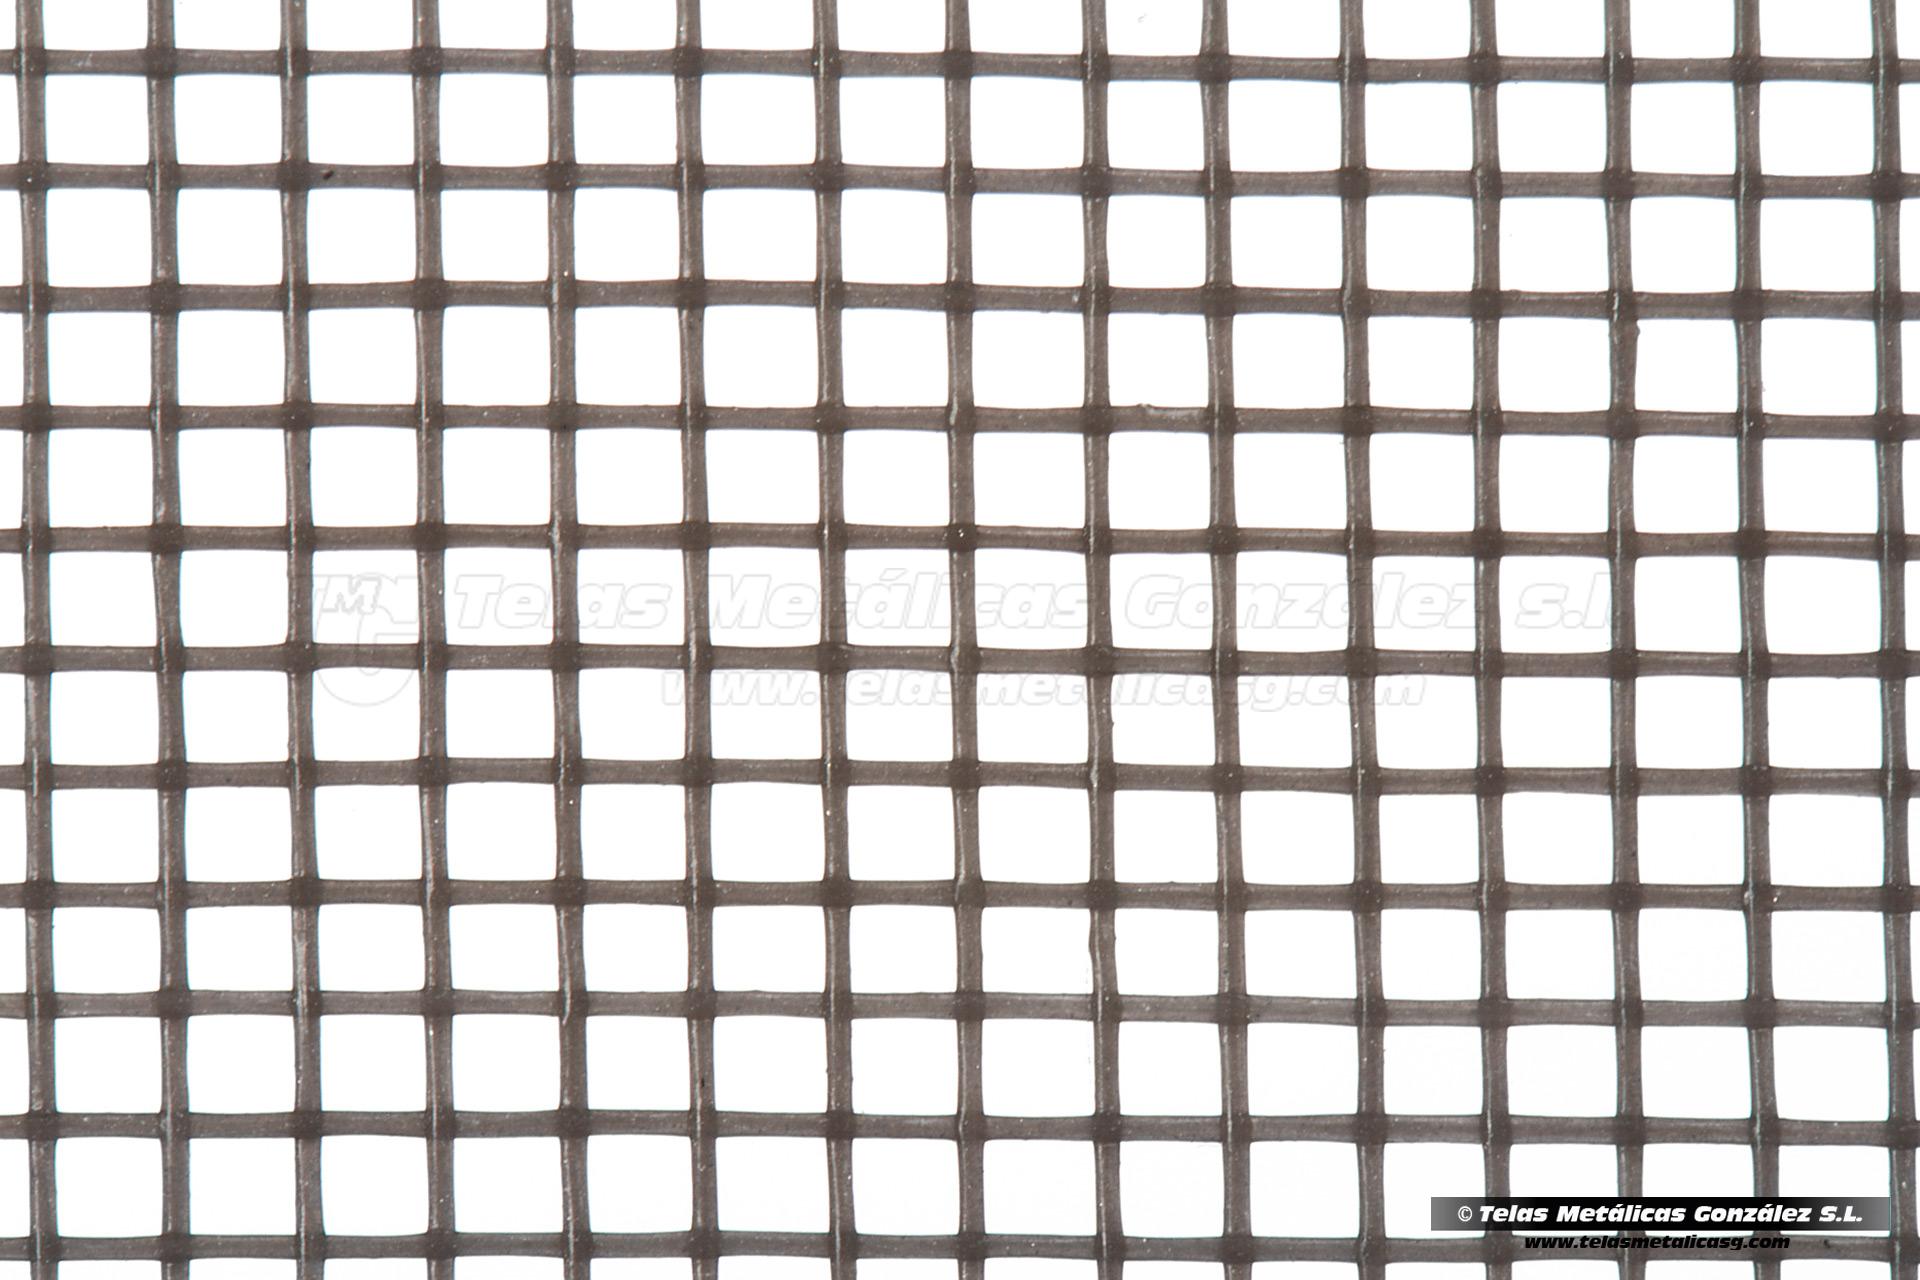 Telas Metálicas González Malla Mosquitera Fibra De Vidrio Industrial Mallas Mosquiteras